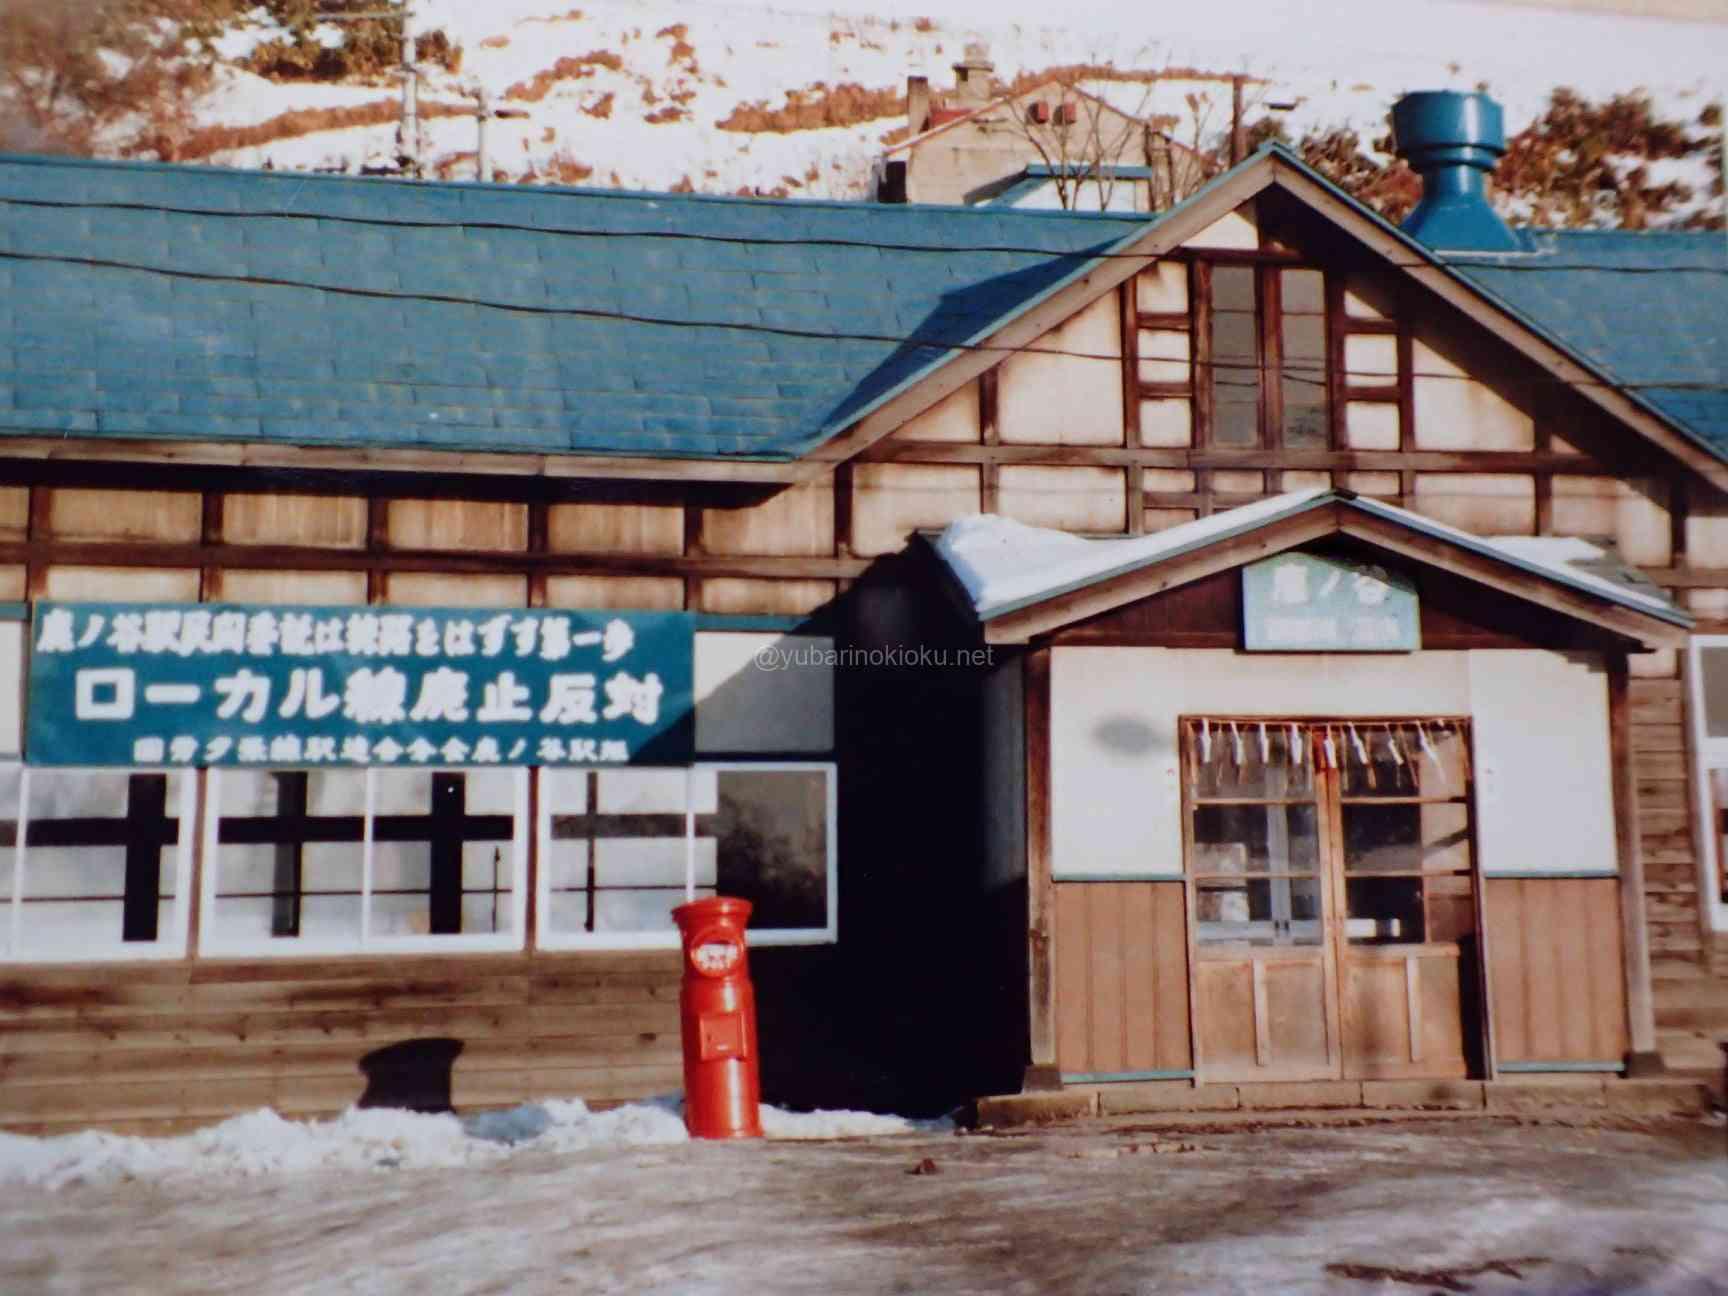 昭和56年正月の夕張線鹿ノ谷駅